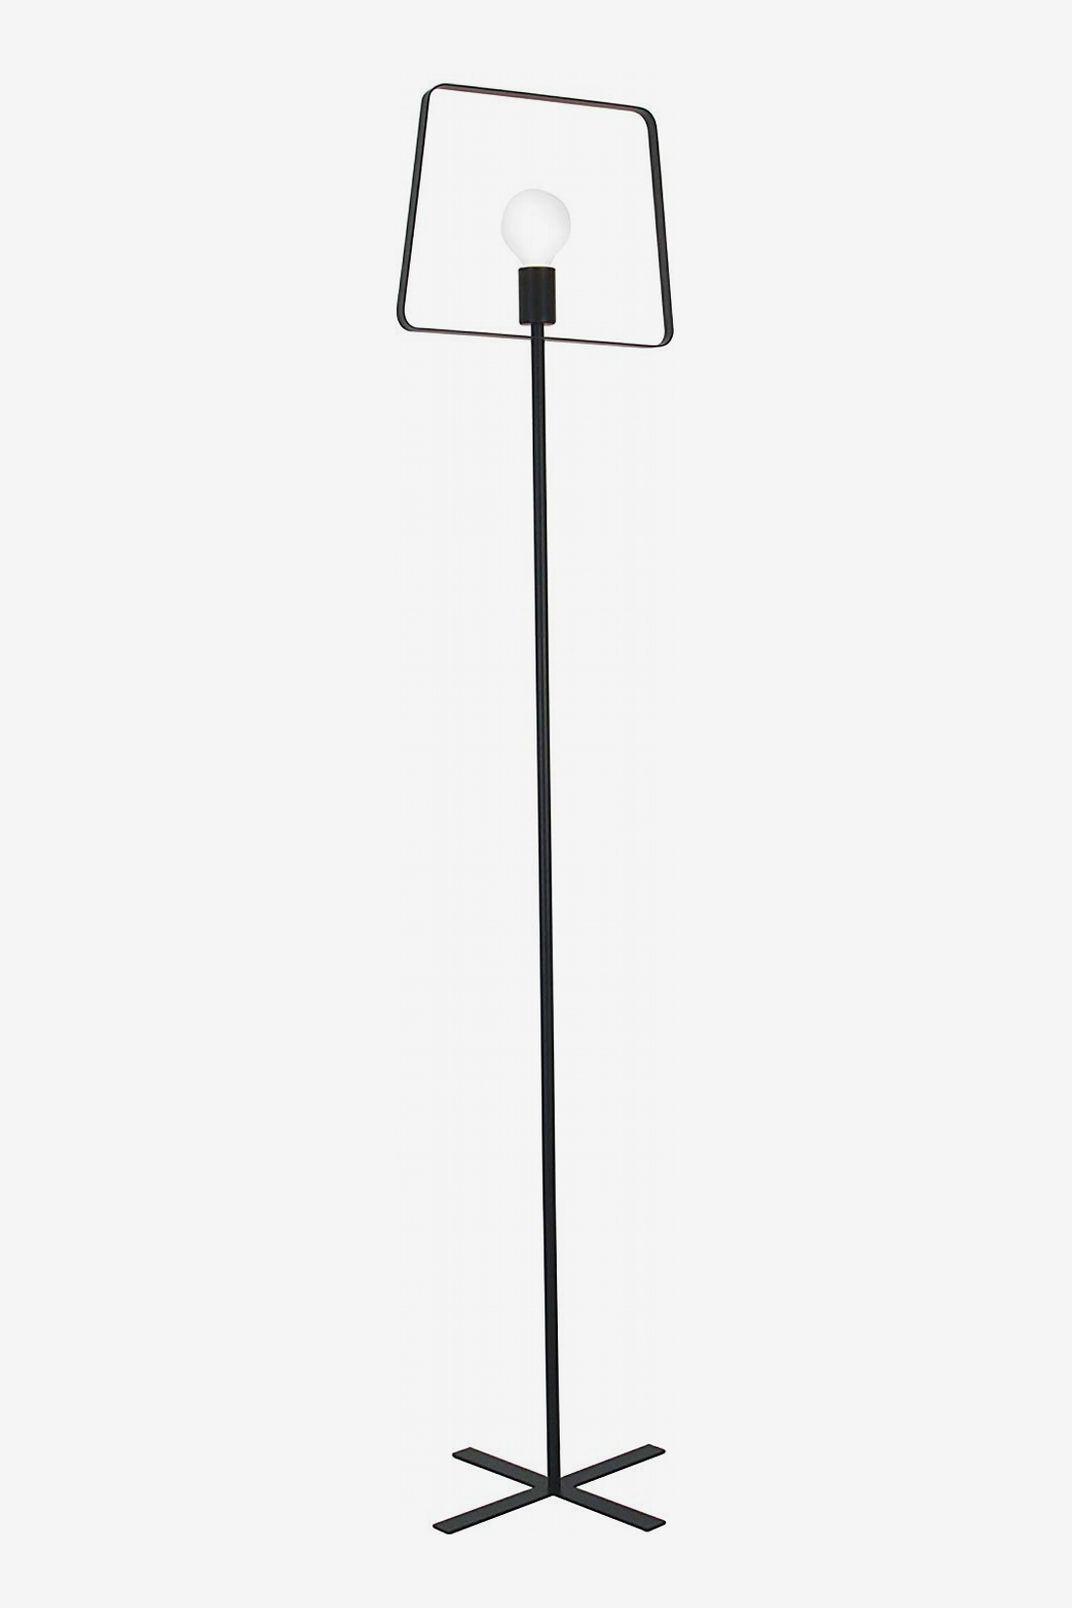 La Jolie Muse Black Industrial Design Uplight Lamp